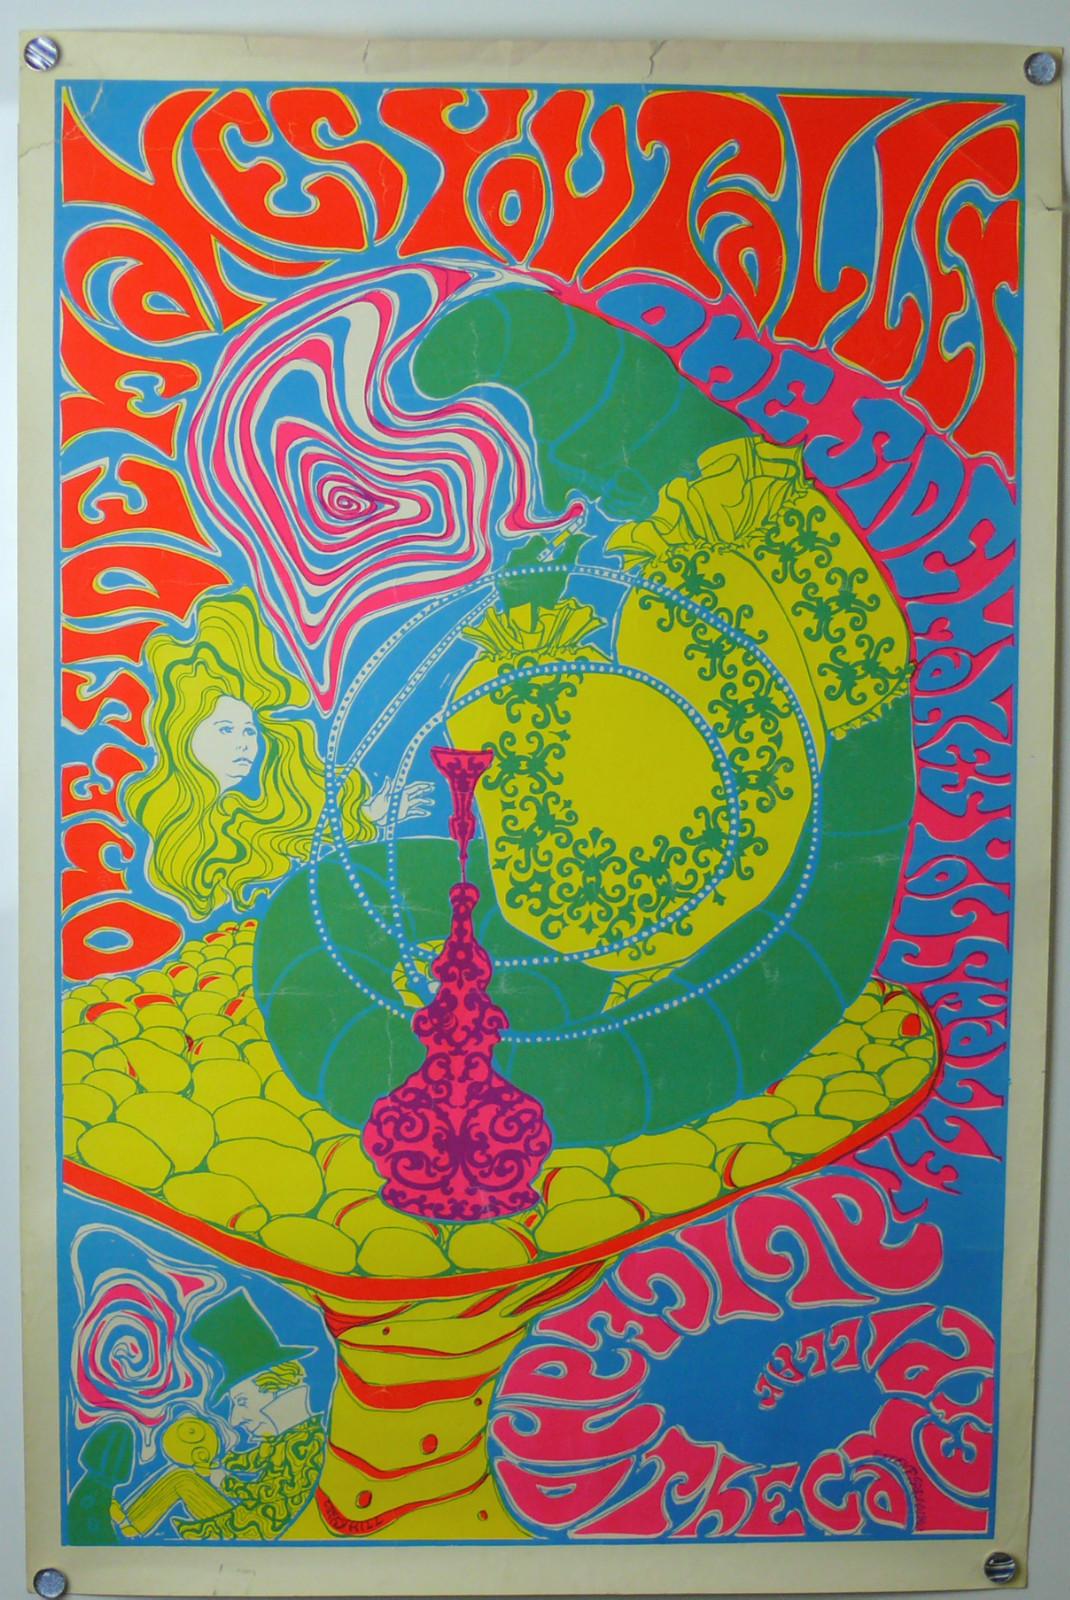 Alice-In-Wonderland-Original-Psychedelic-Poster-Fluorescent-Inks-wallpaper-wp5203965